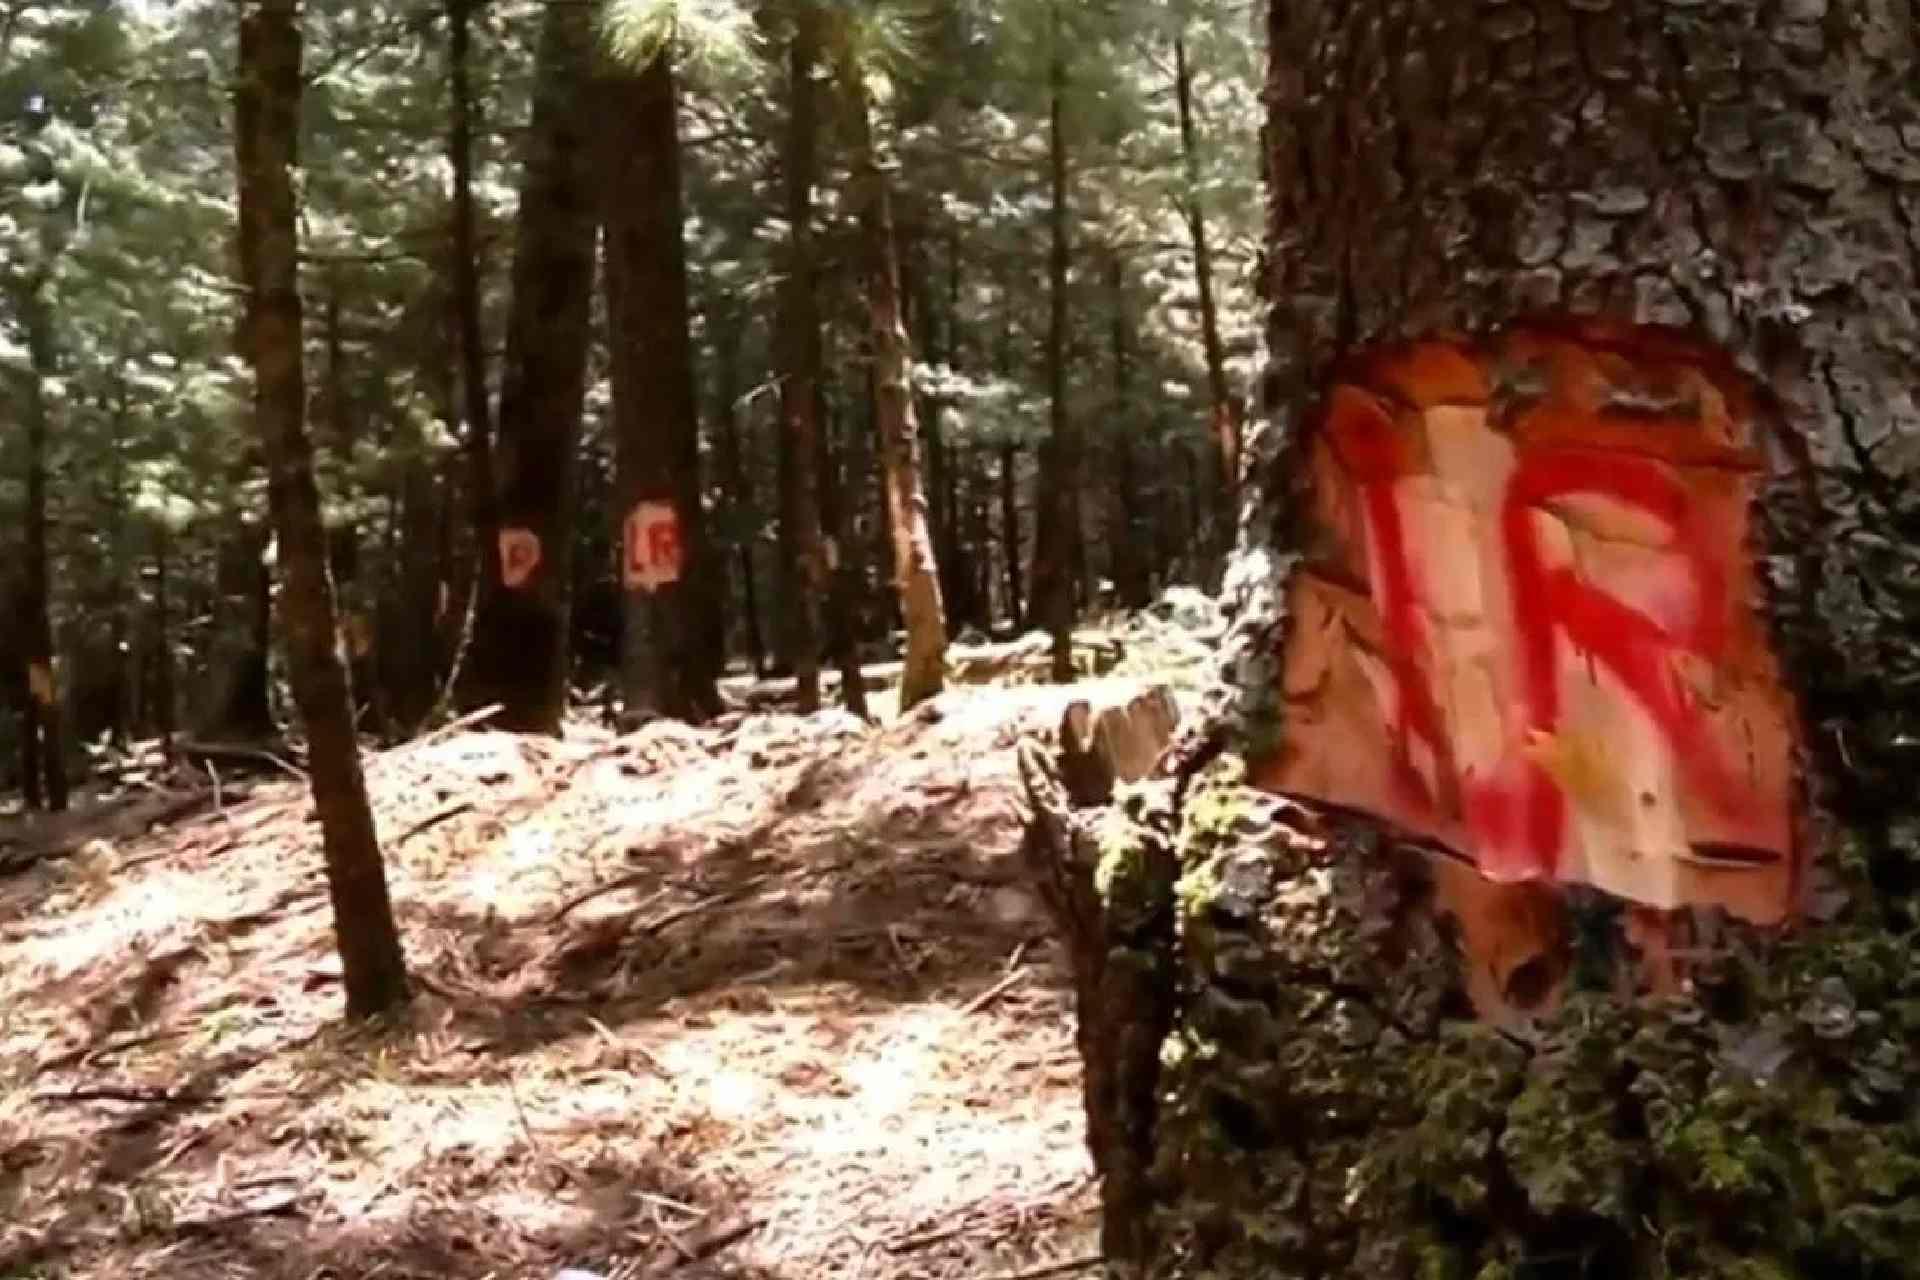 ingenieros forestales-Tlaxcala-La Malinche-Bosques-Tala de árboles